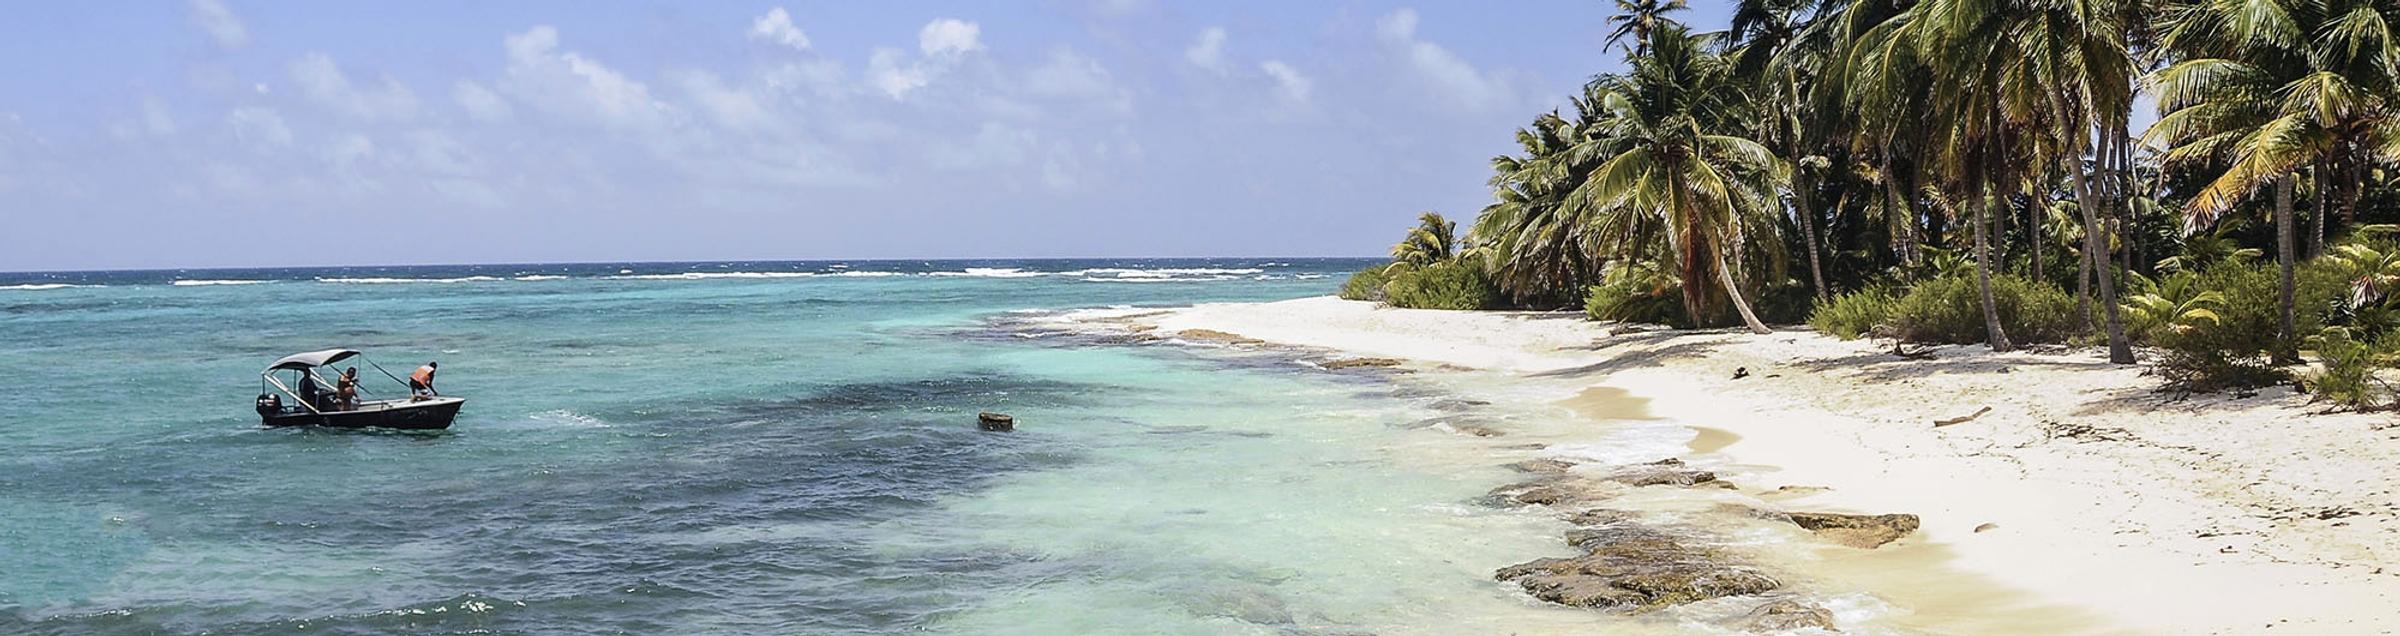 остров Сан-Андрес